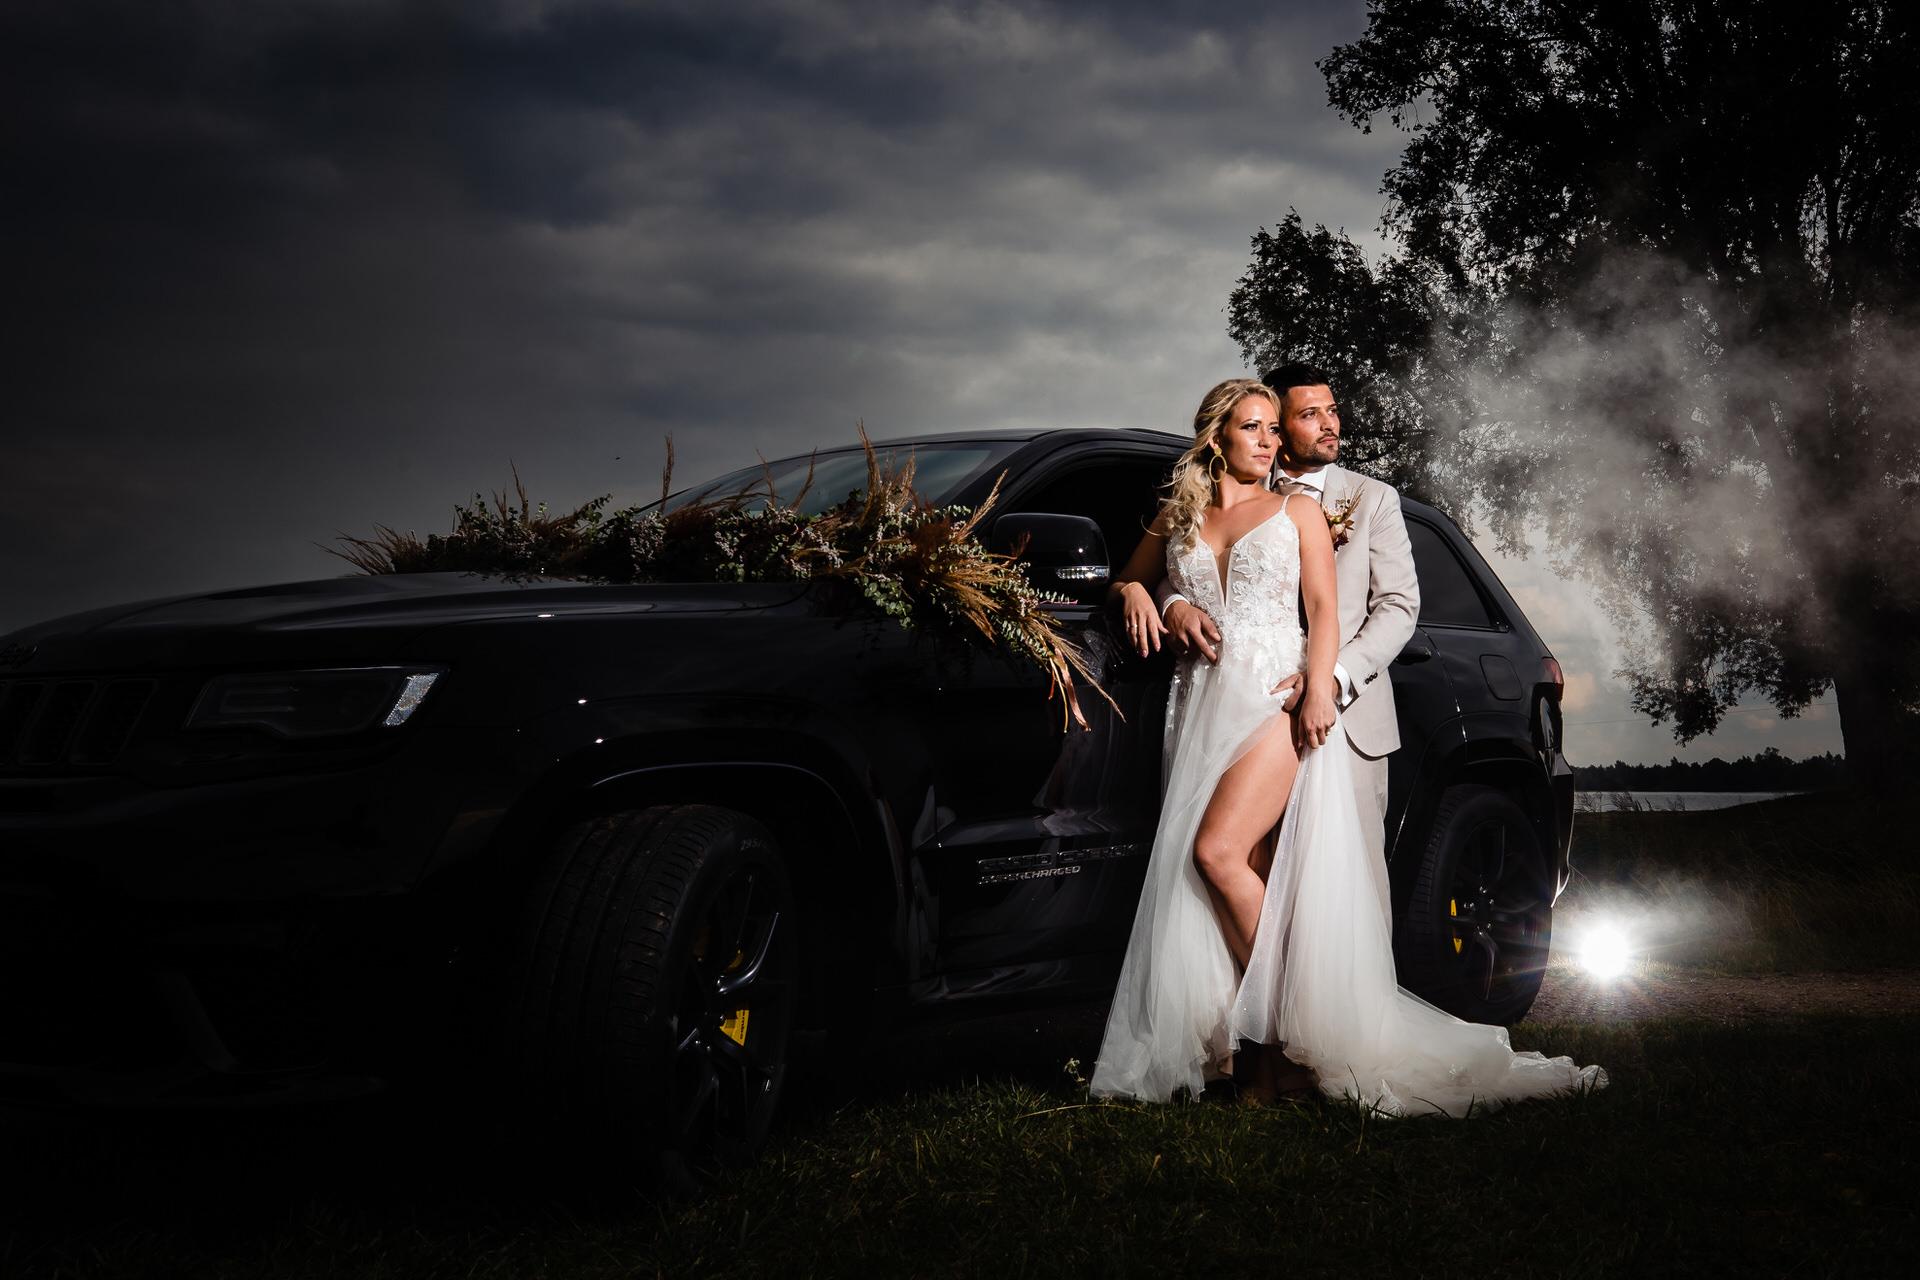 Bruidsfotograaf |Valburg | Theo & Leonieke